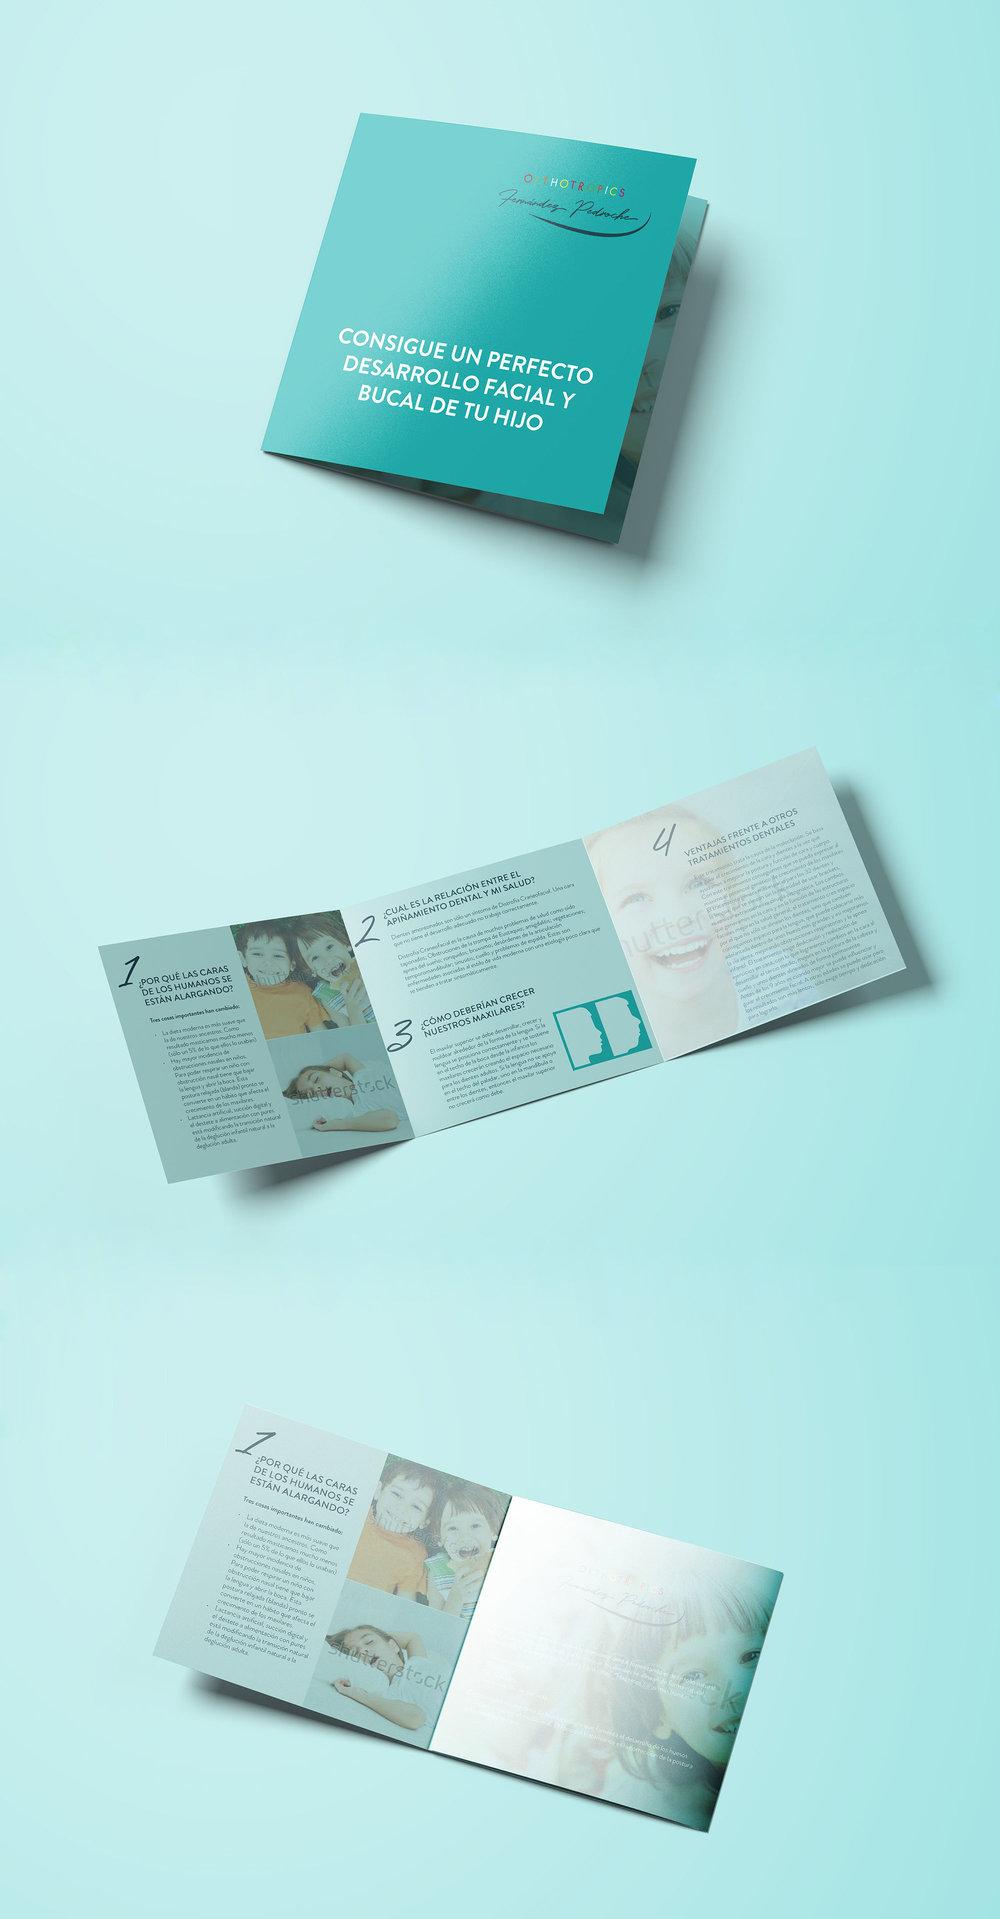 folleto orthotropics